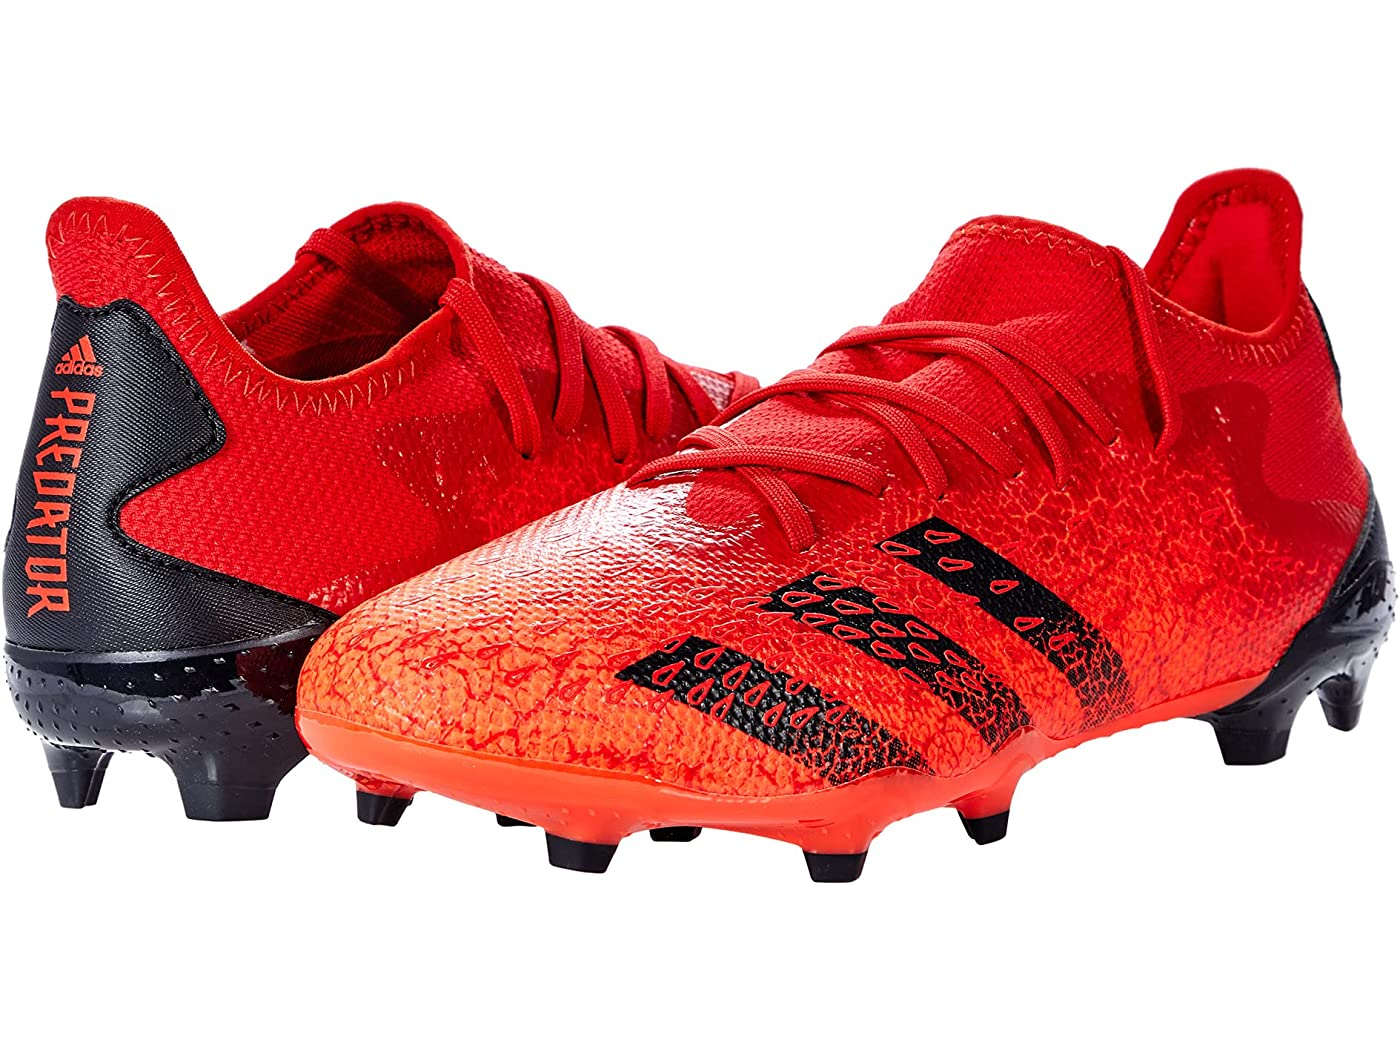 Adidas Predator Freak 3 Low Firm Ground Soccer Cleats